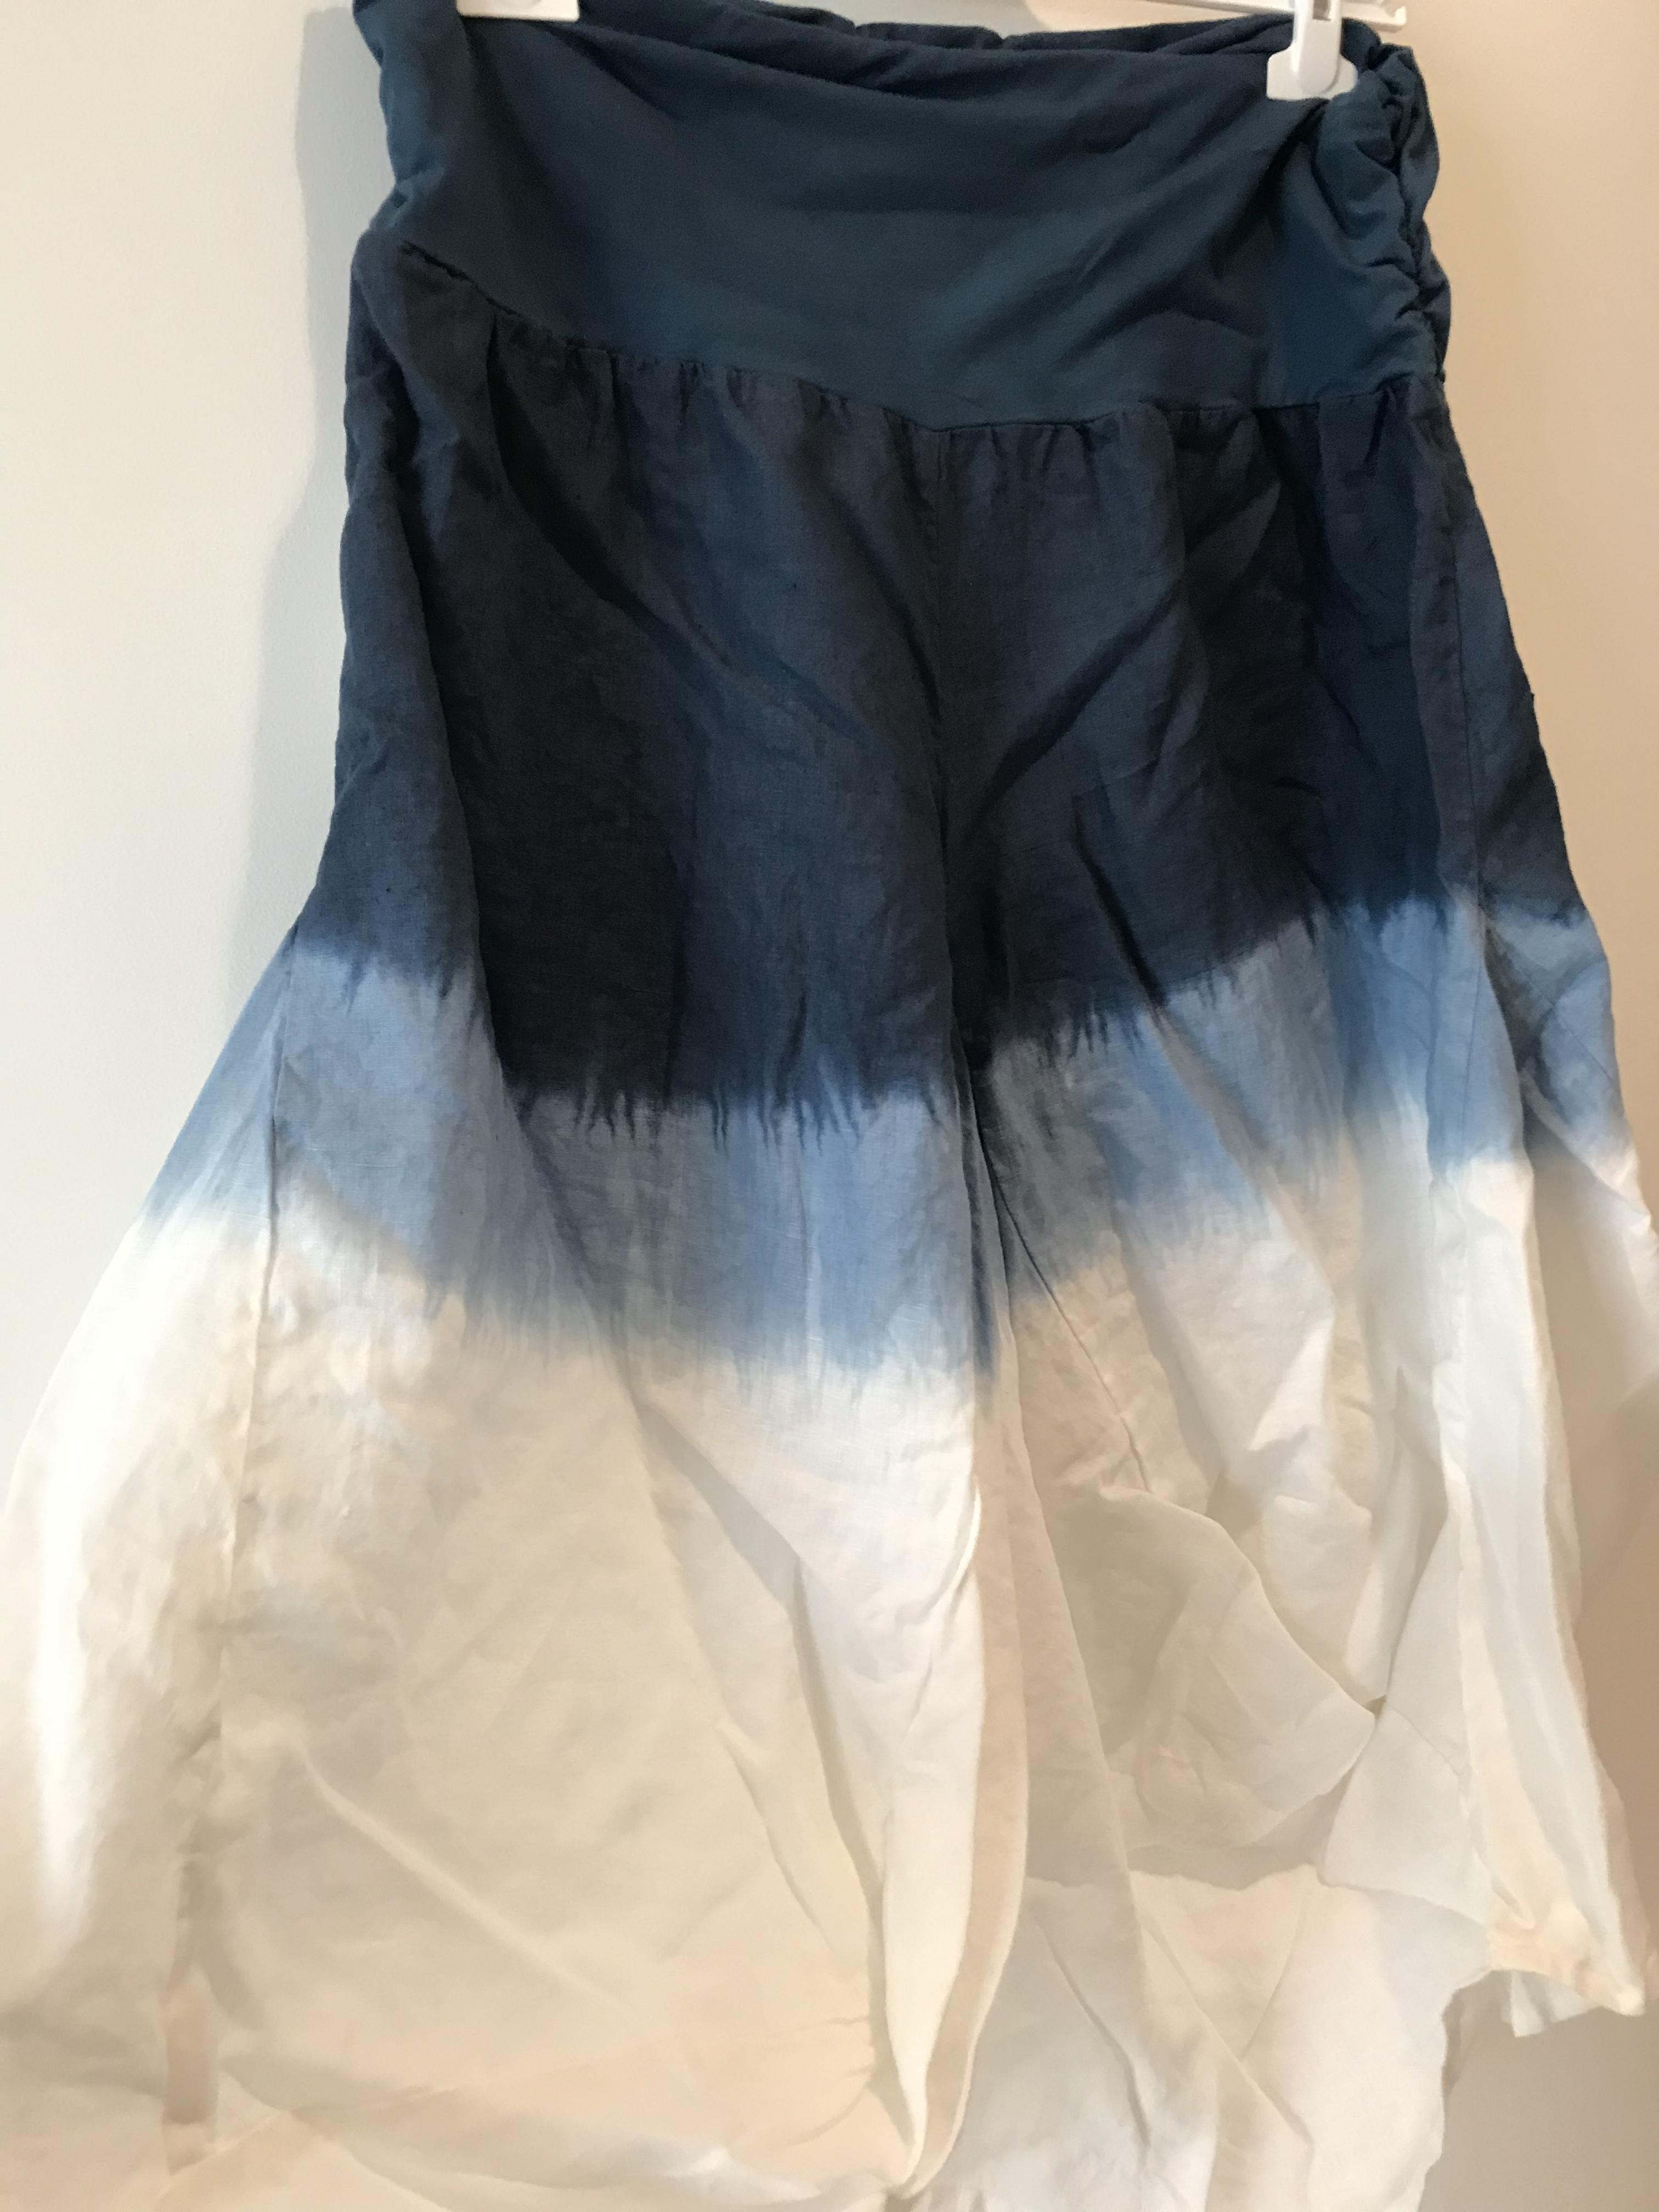 Luna Luz: Swivel Hemline Linen Midi Pocket Skirt With Ties (Ships Immed in Navy Ombre, 1 Left!)